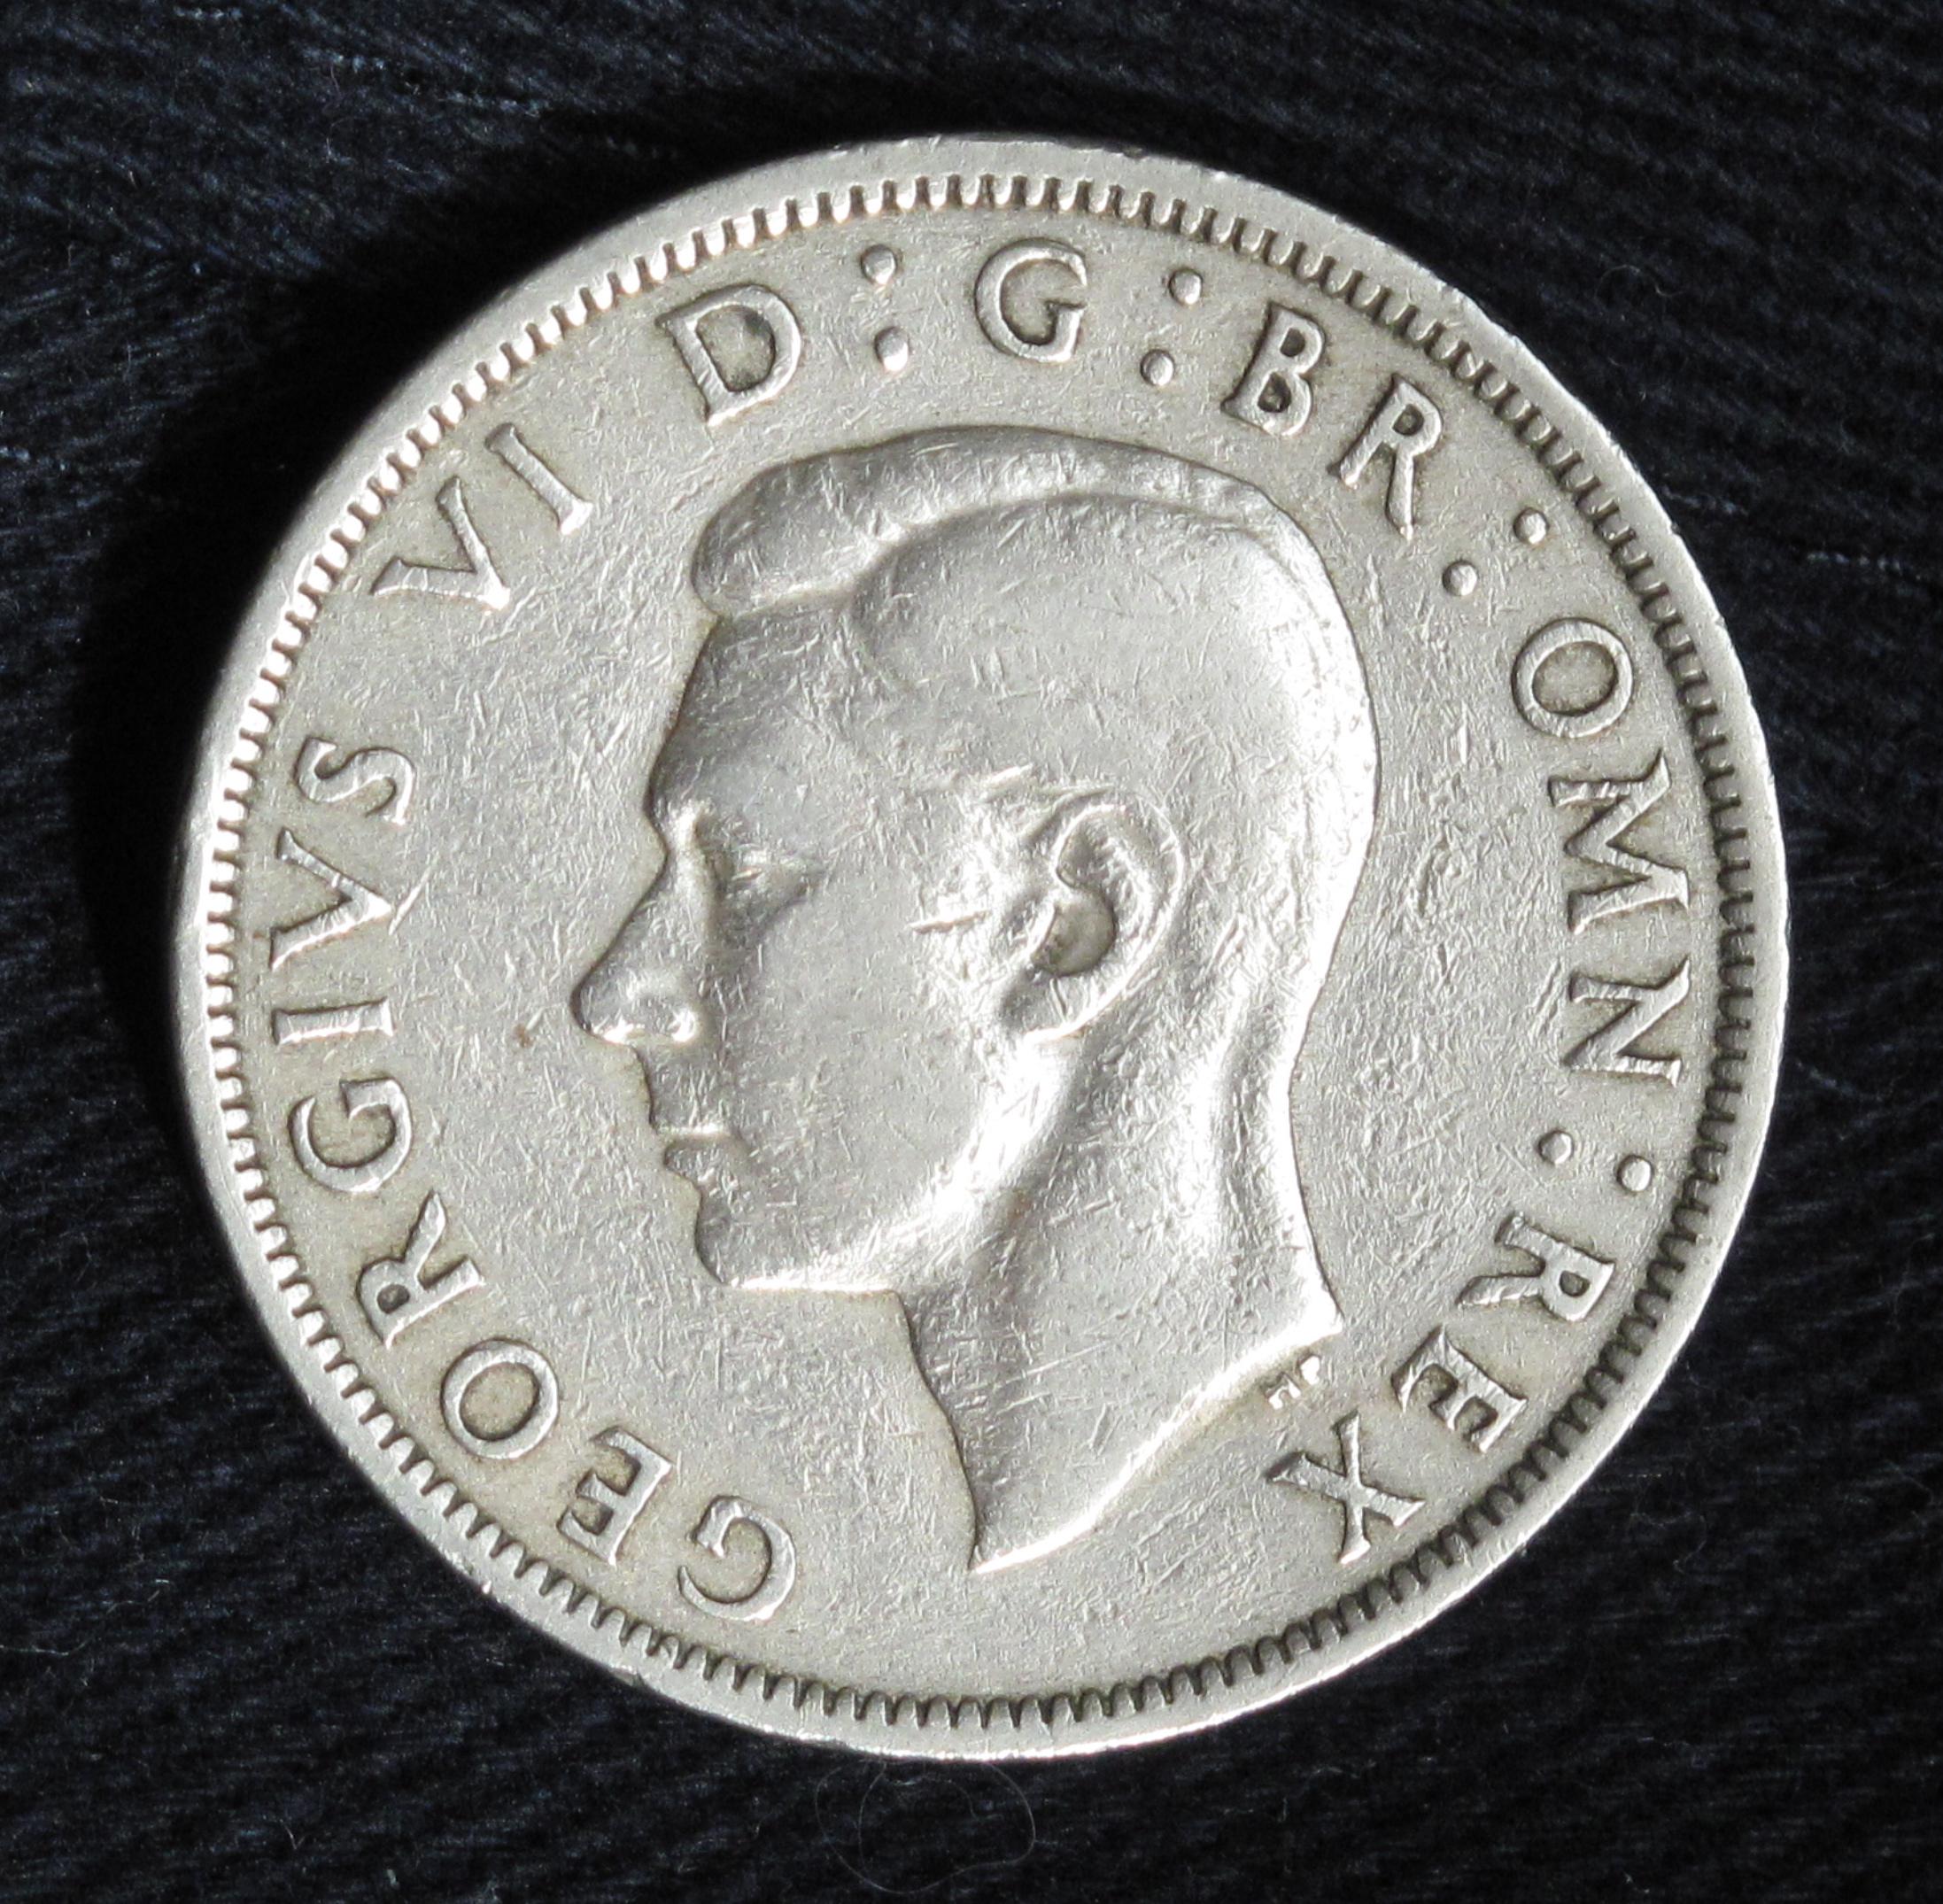 Cpay coin reddit questions - Cdn coin good or bad man